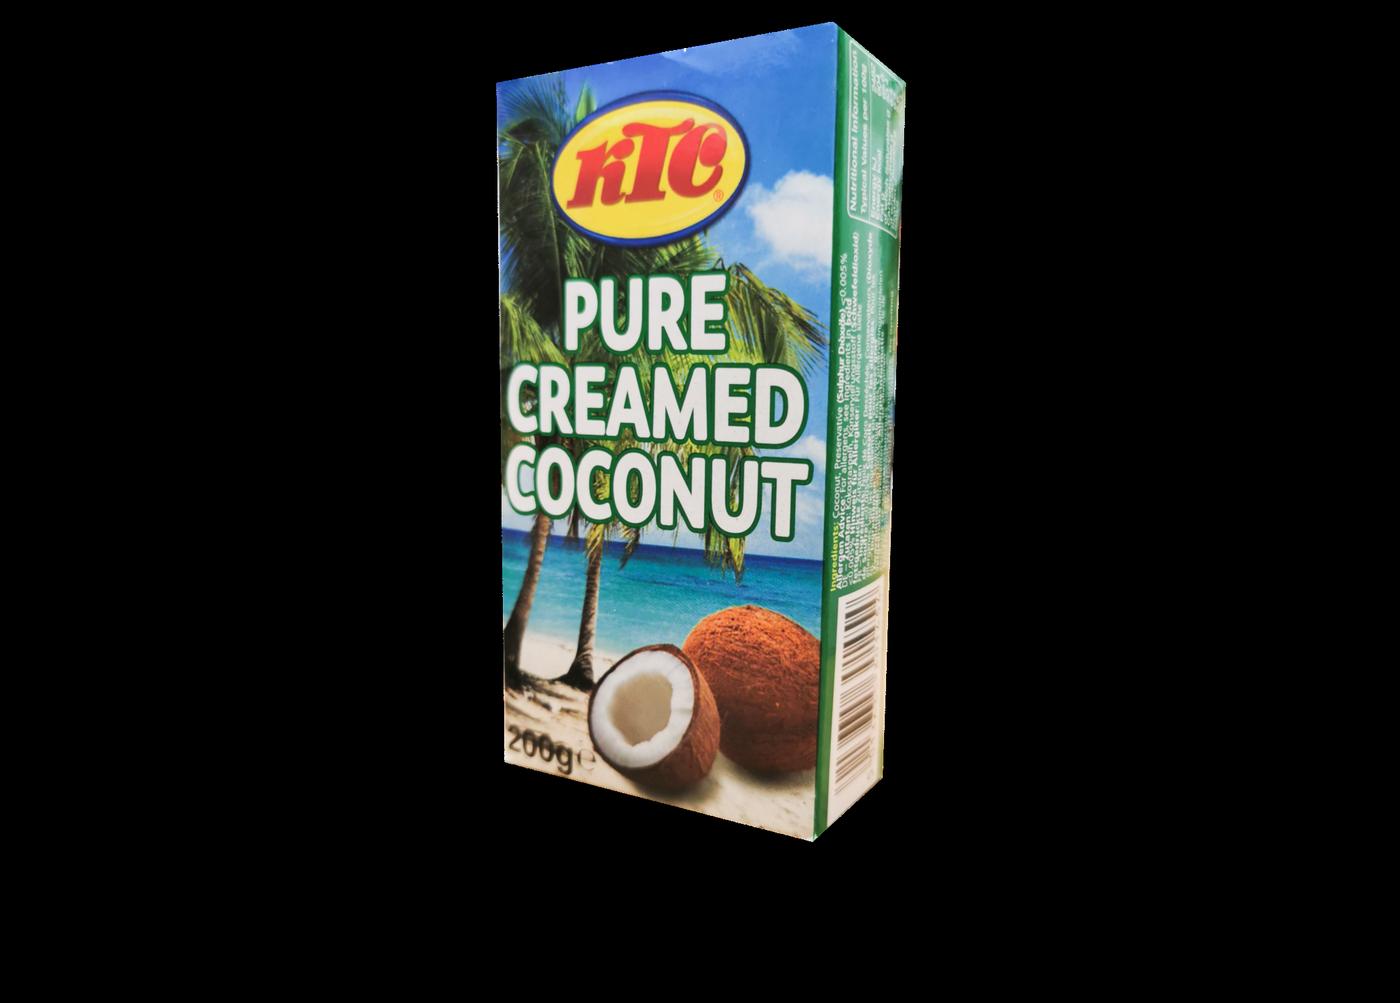 KTC Pure Creamed Coconut